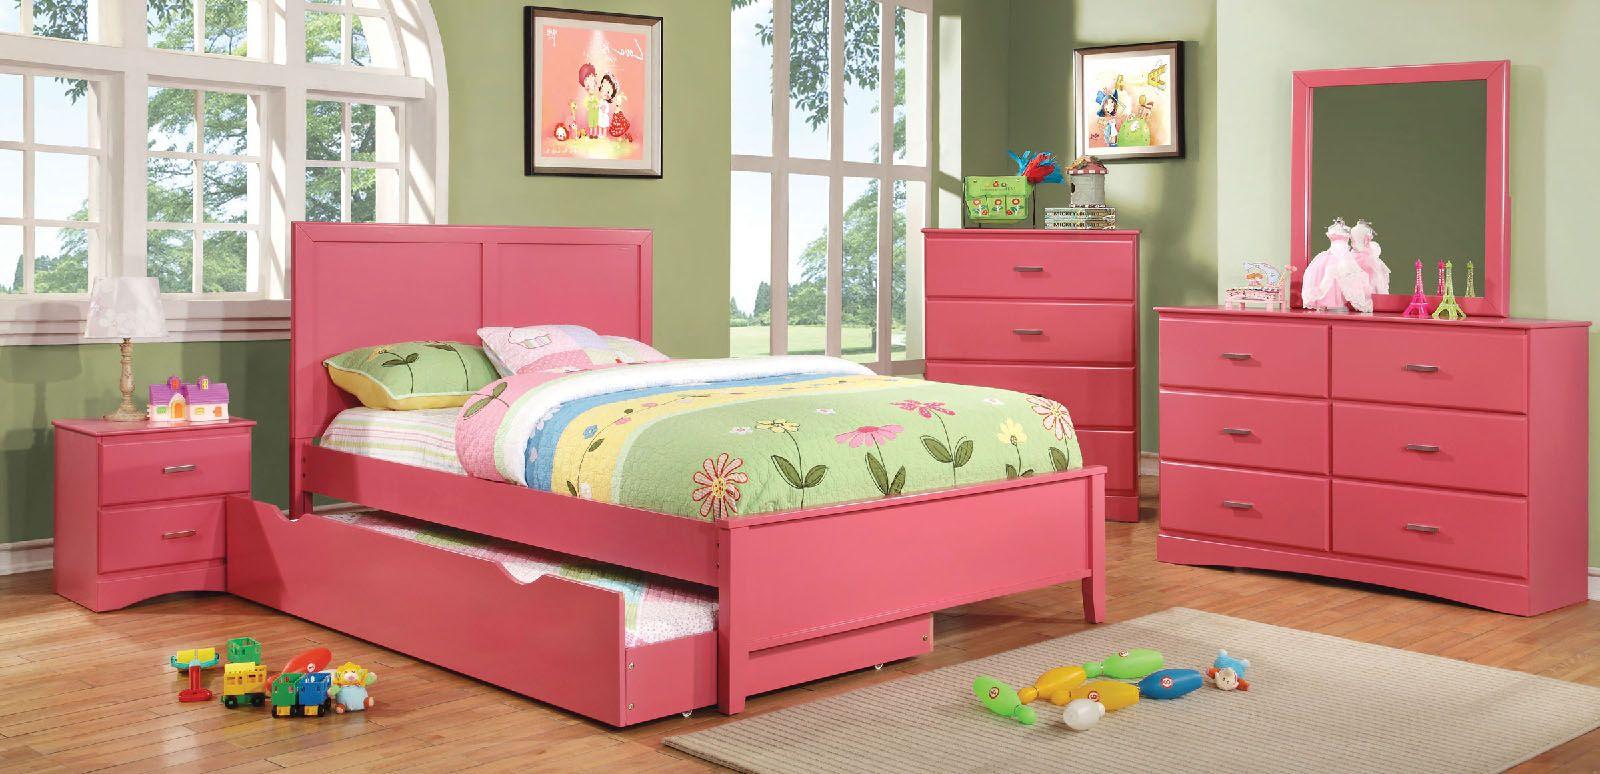 Prismo Pink Wood Bedroom Set Las Vegas Furniture Store Modern Home